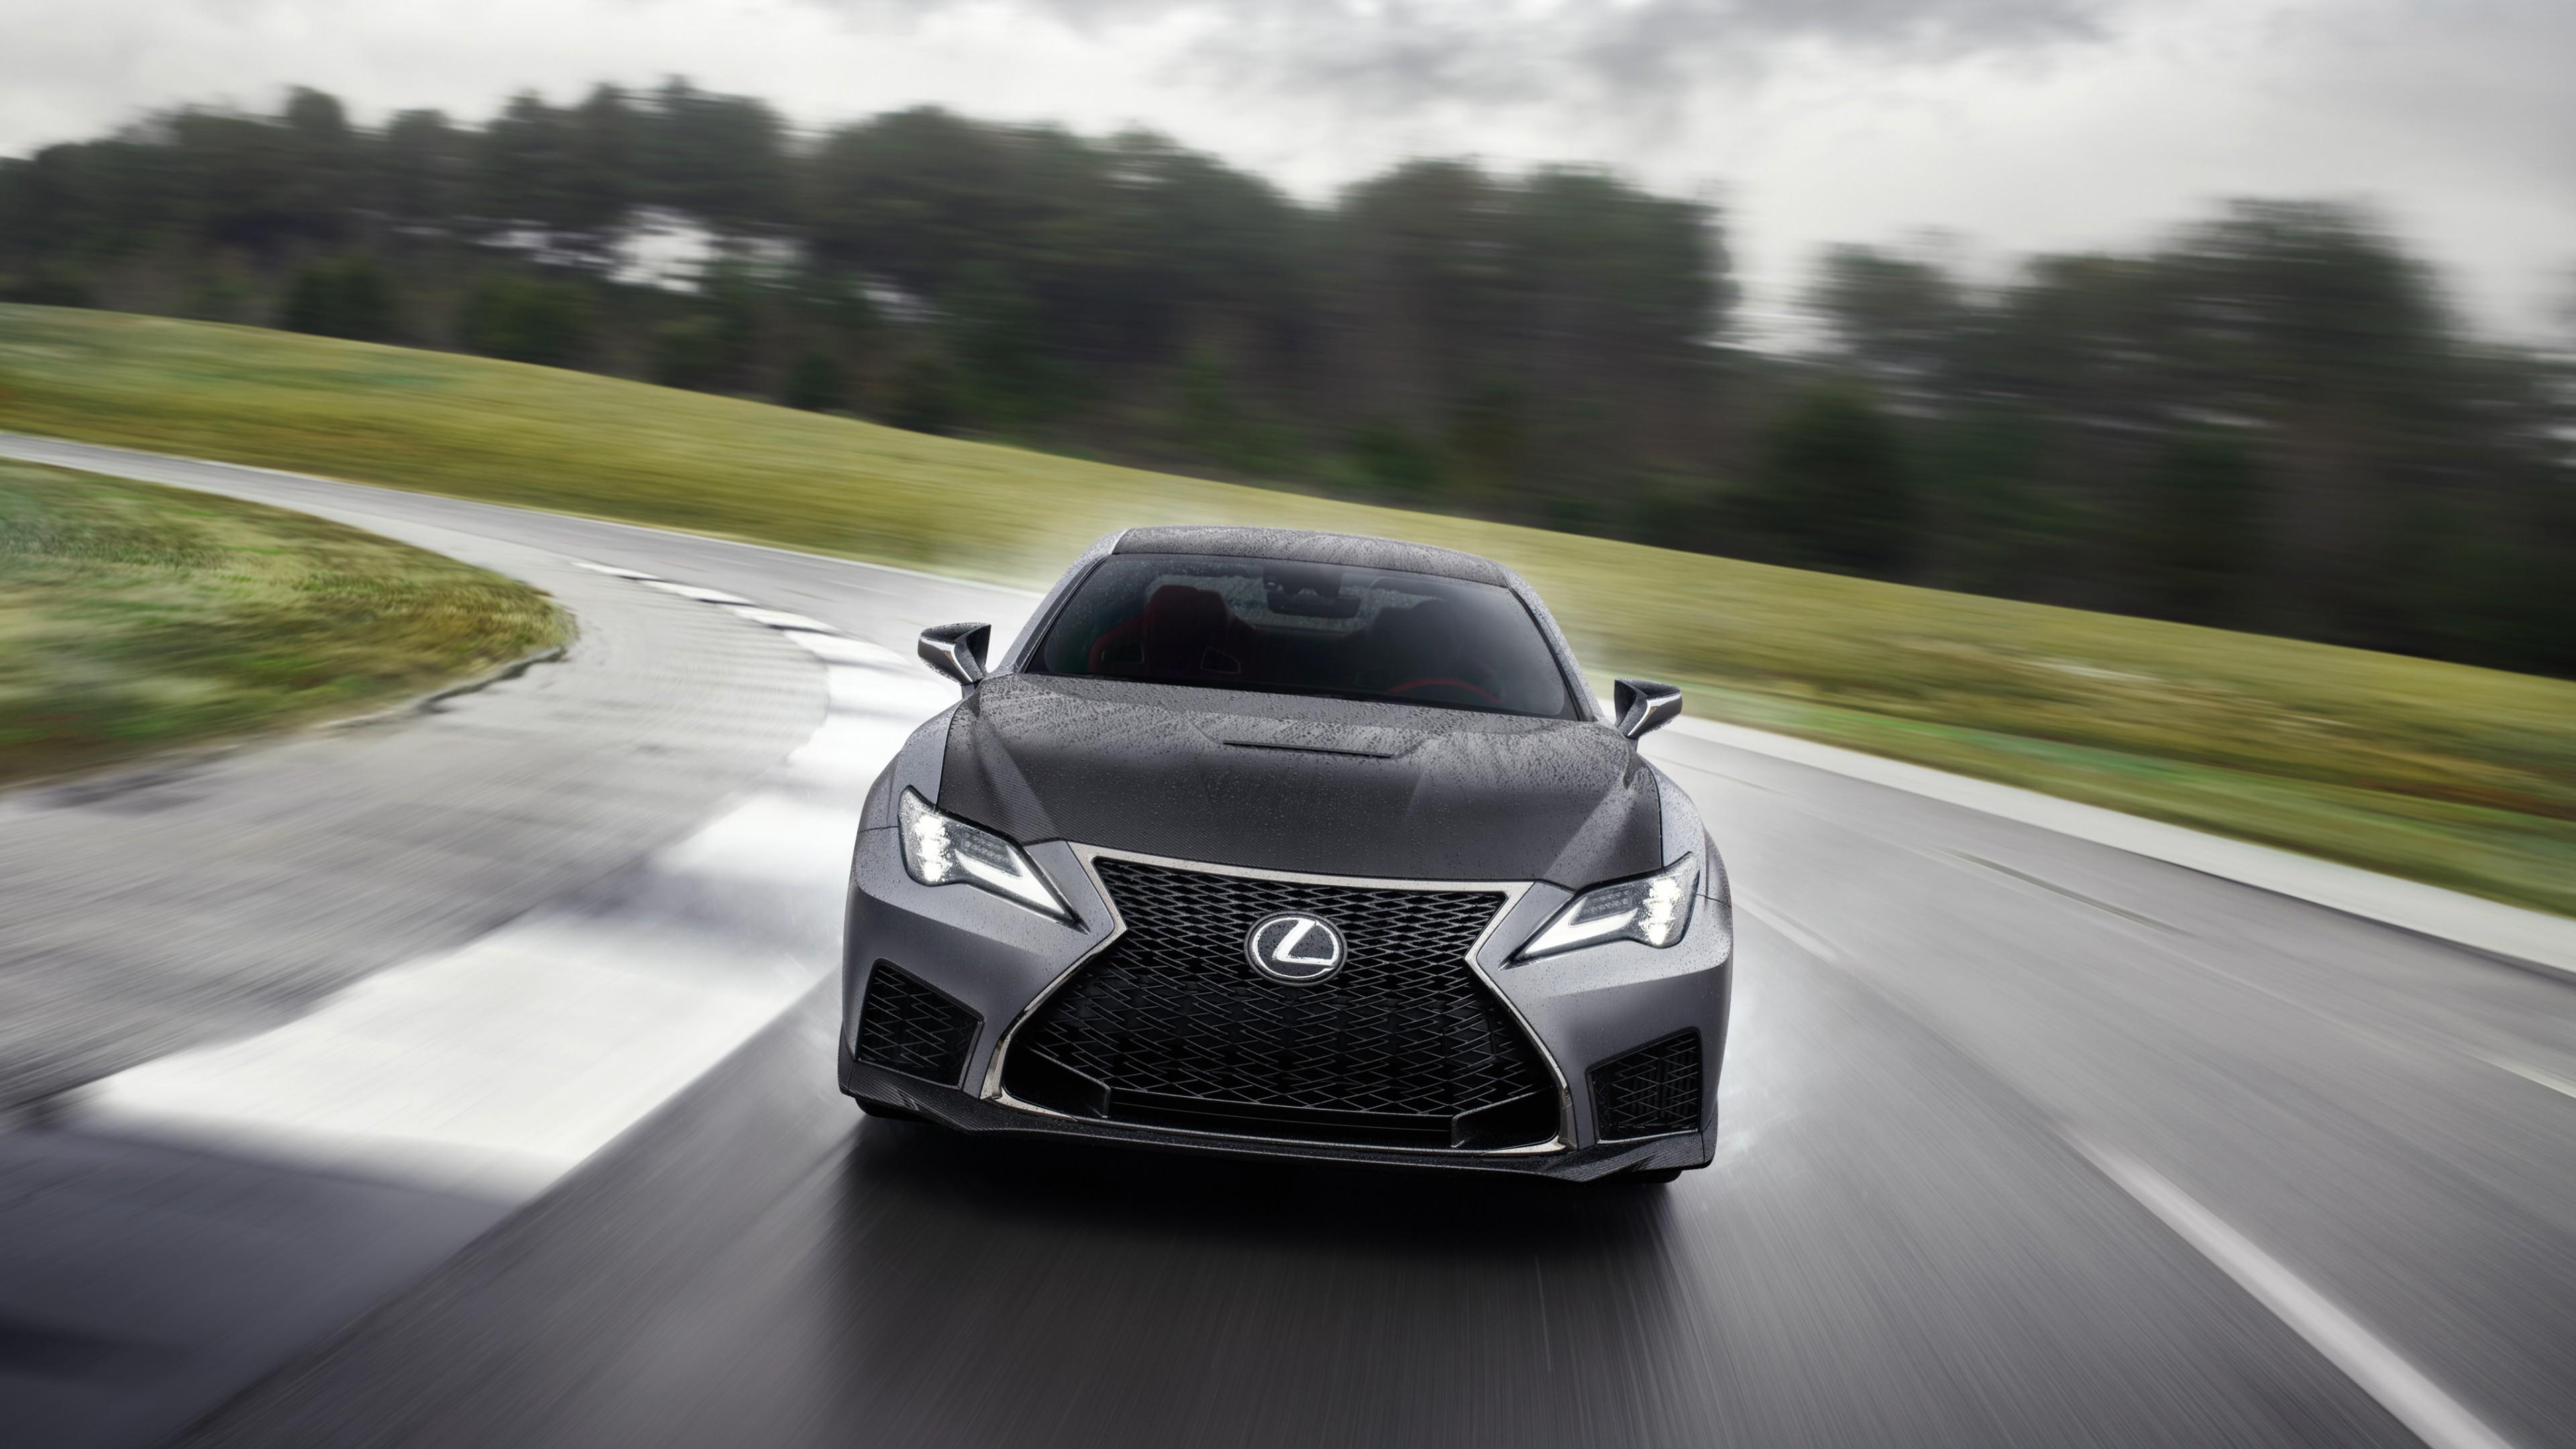 2020 Lexus Rc F Track Edition 4k 4 Wallpaper Hd Car Wallpapers Id 11899